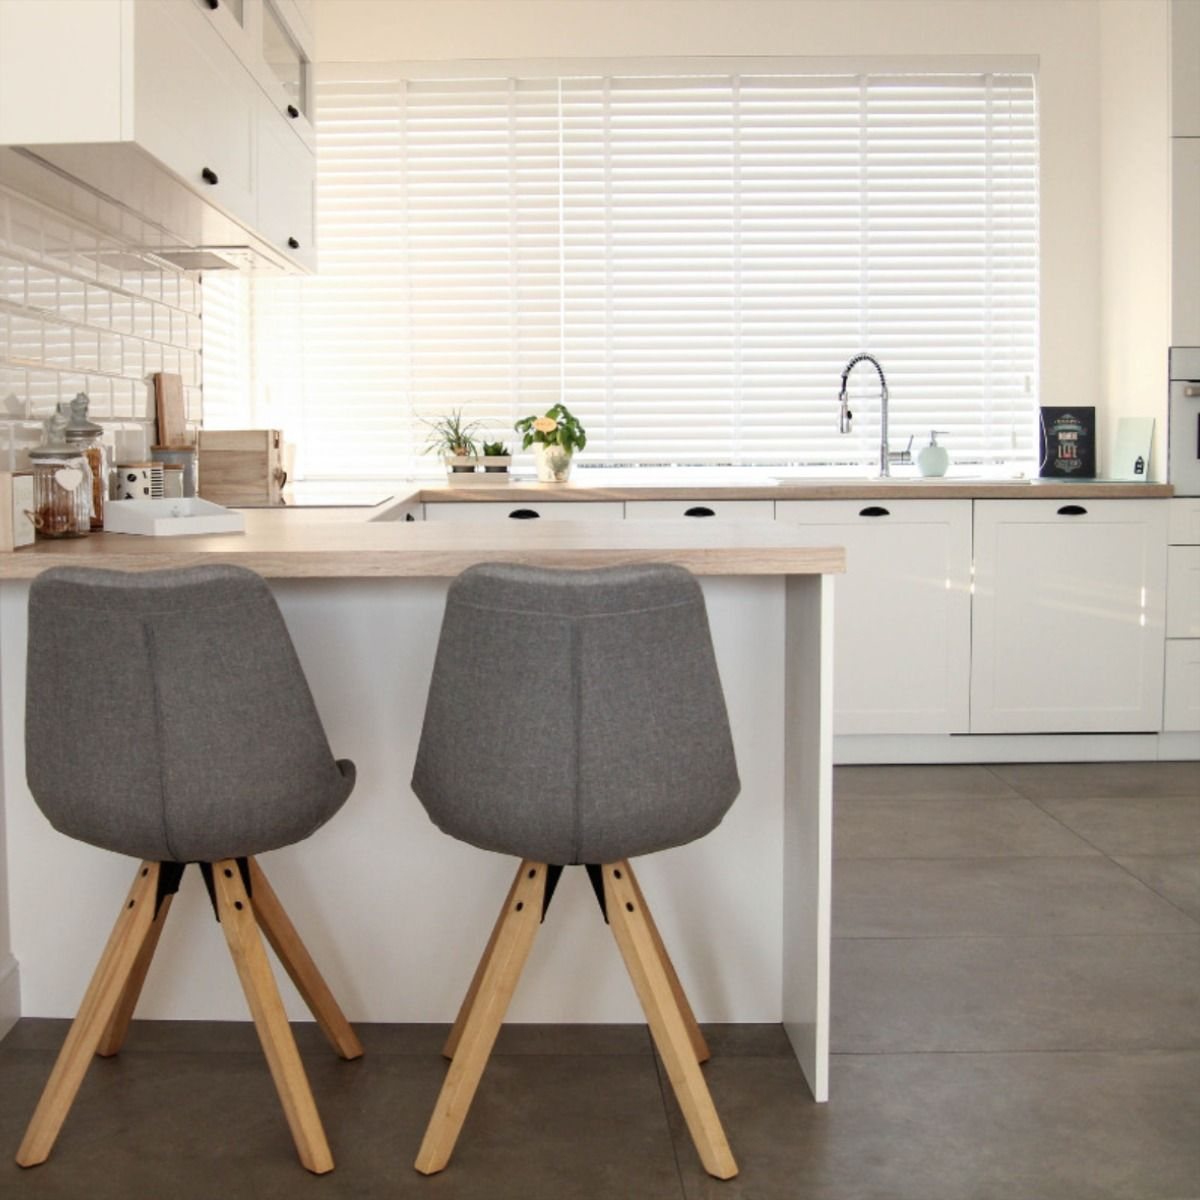 Meble Kuchenne Na Wymiar W Macie Furniture Home Decor Decor